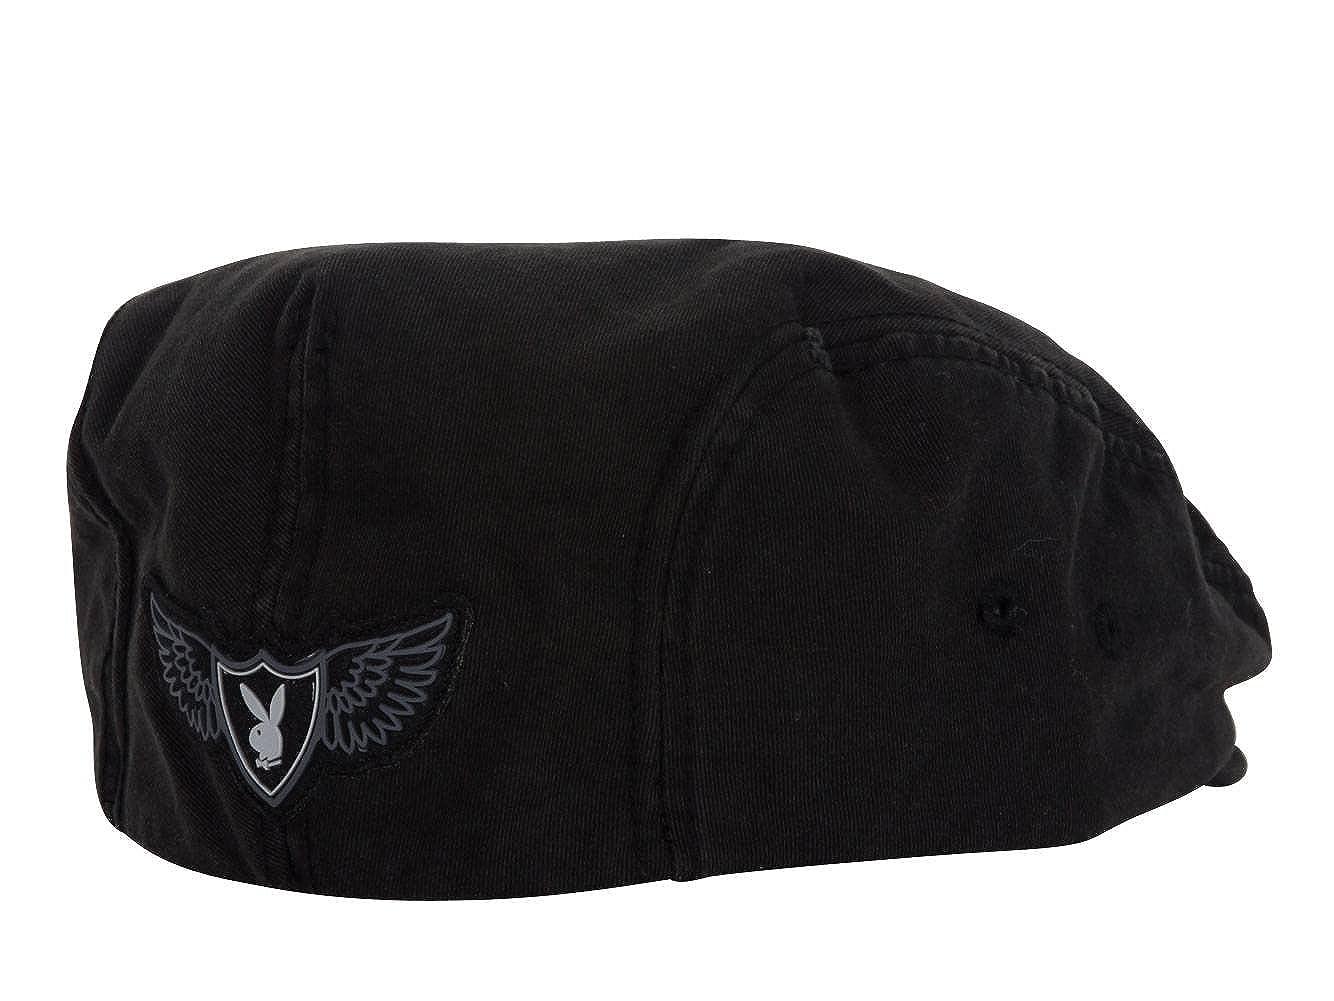 PB Swiss Playboy Ivy Hat Black